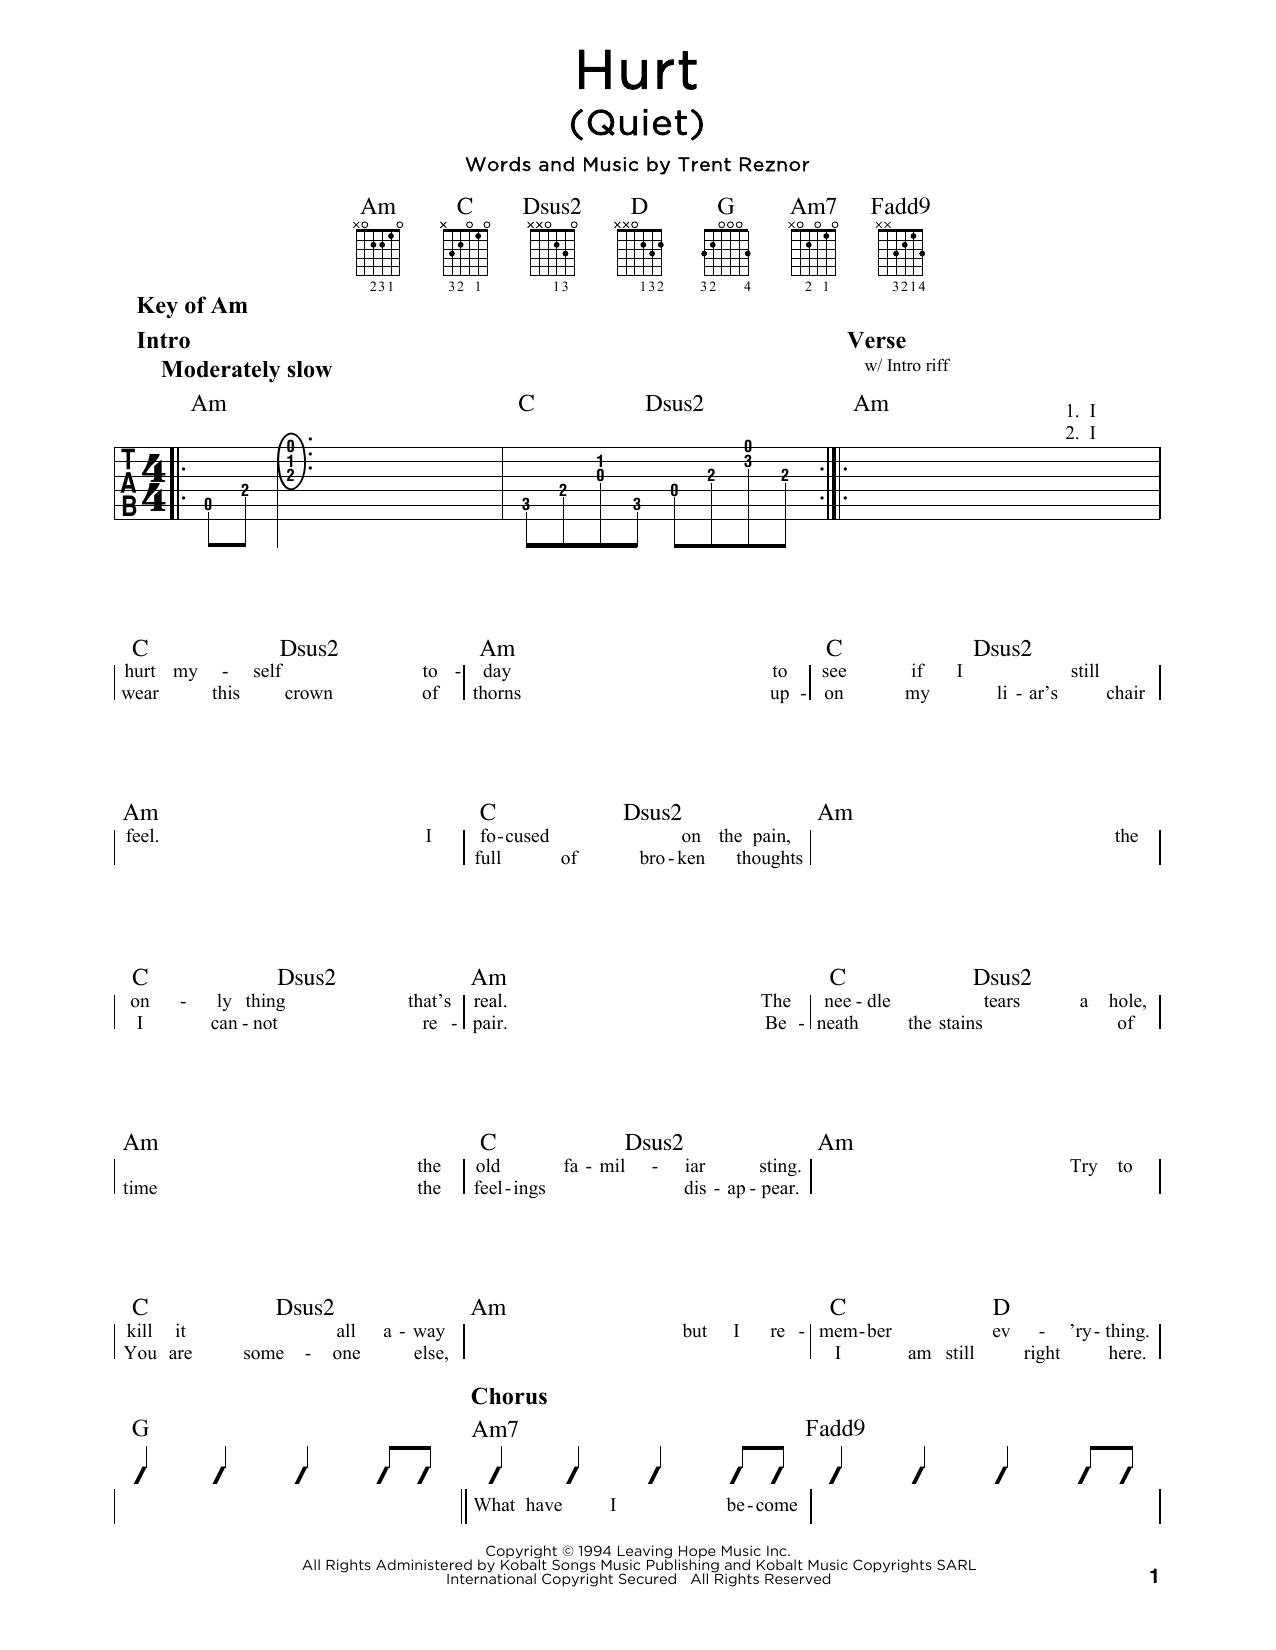 Johnny Cash Hurt Quiet Sheet Music Notes Chords Printable Pop